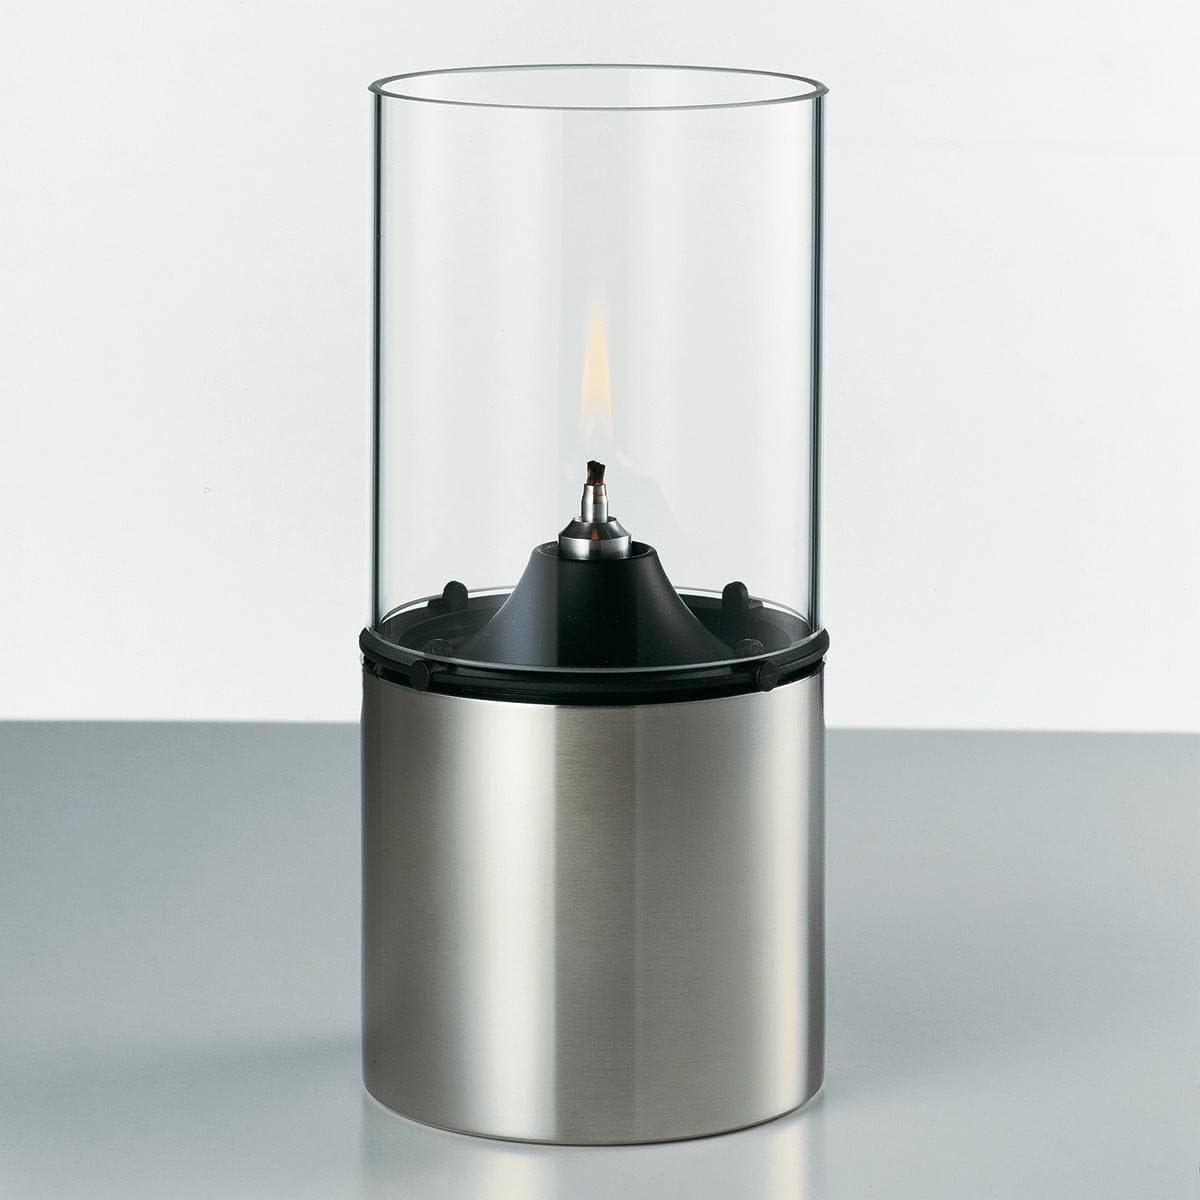 Stelton l/ámpara de aceite transparente cristal Acero Inoxidable Plata 18/cm 1005